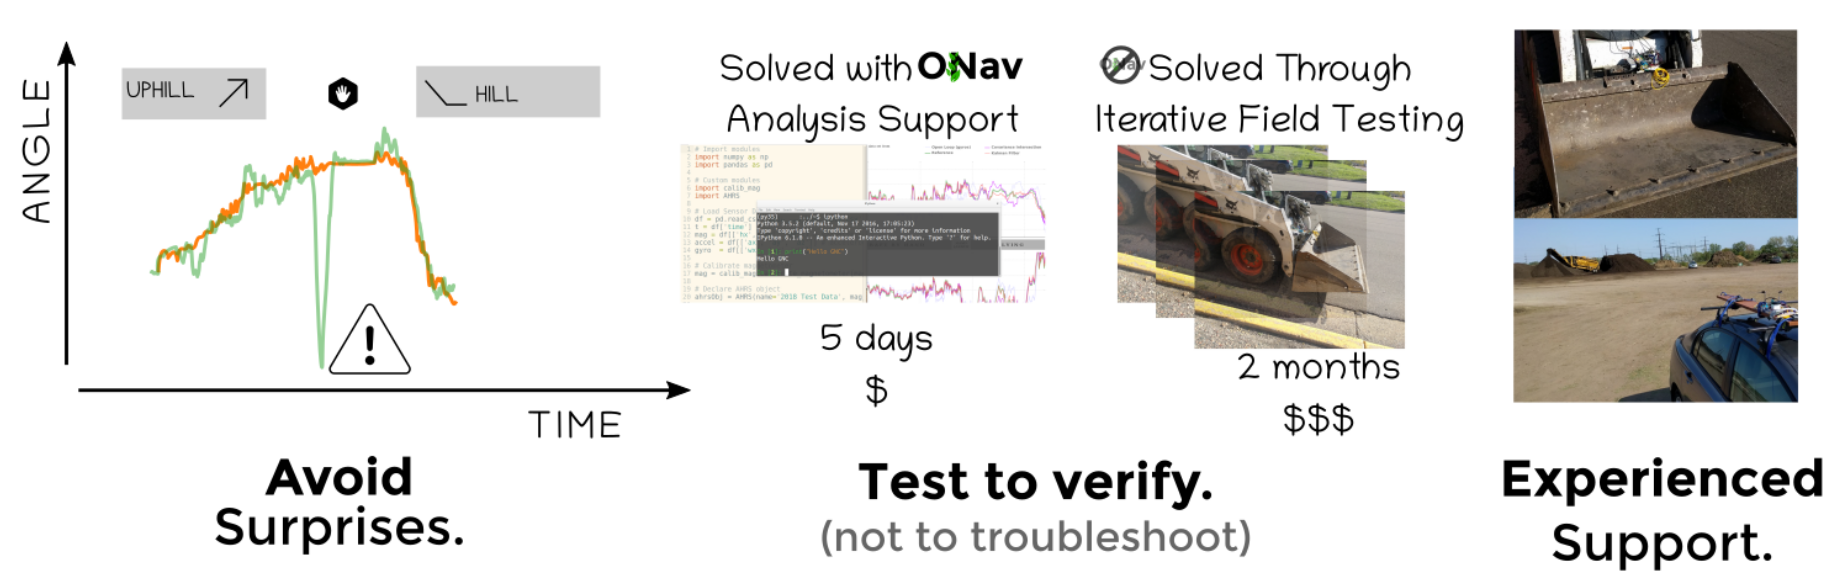 Diagram illustrating benefit of ONav Support Service.